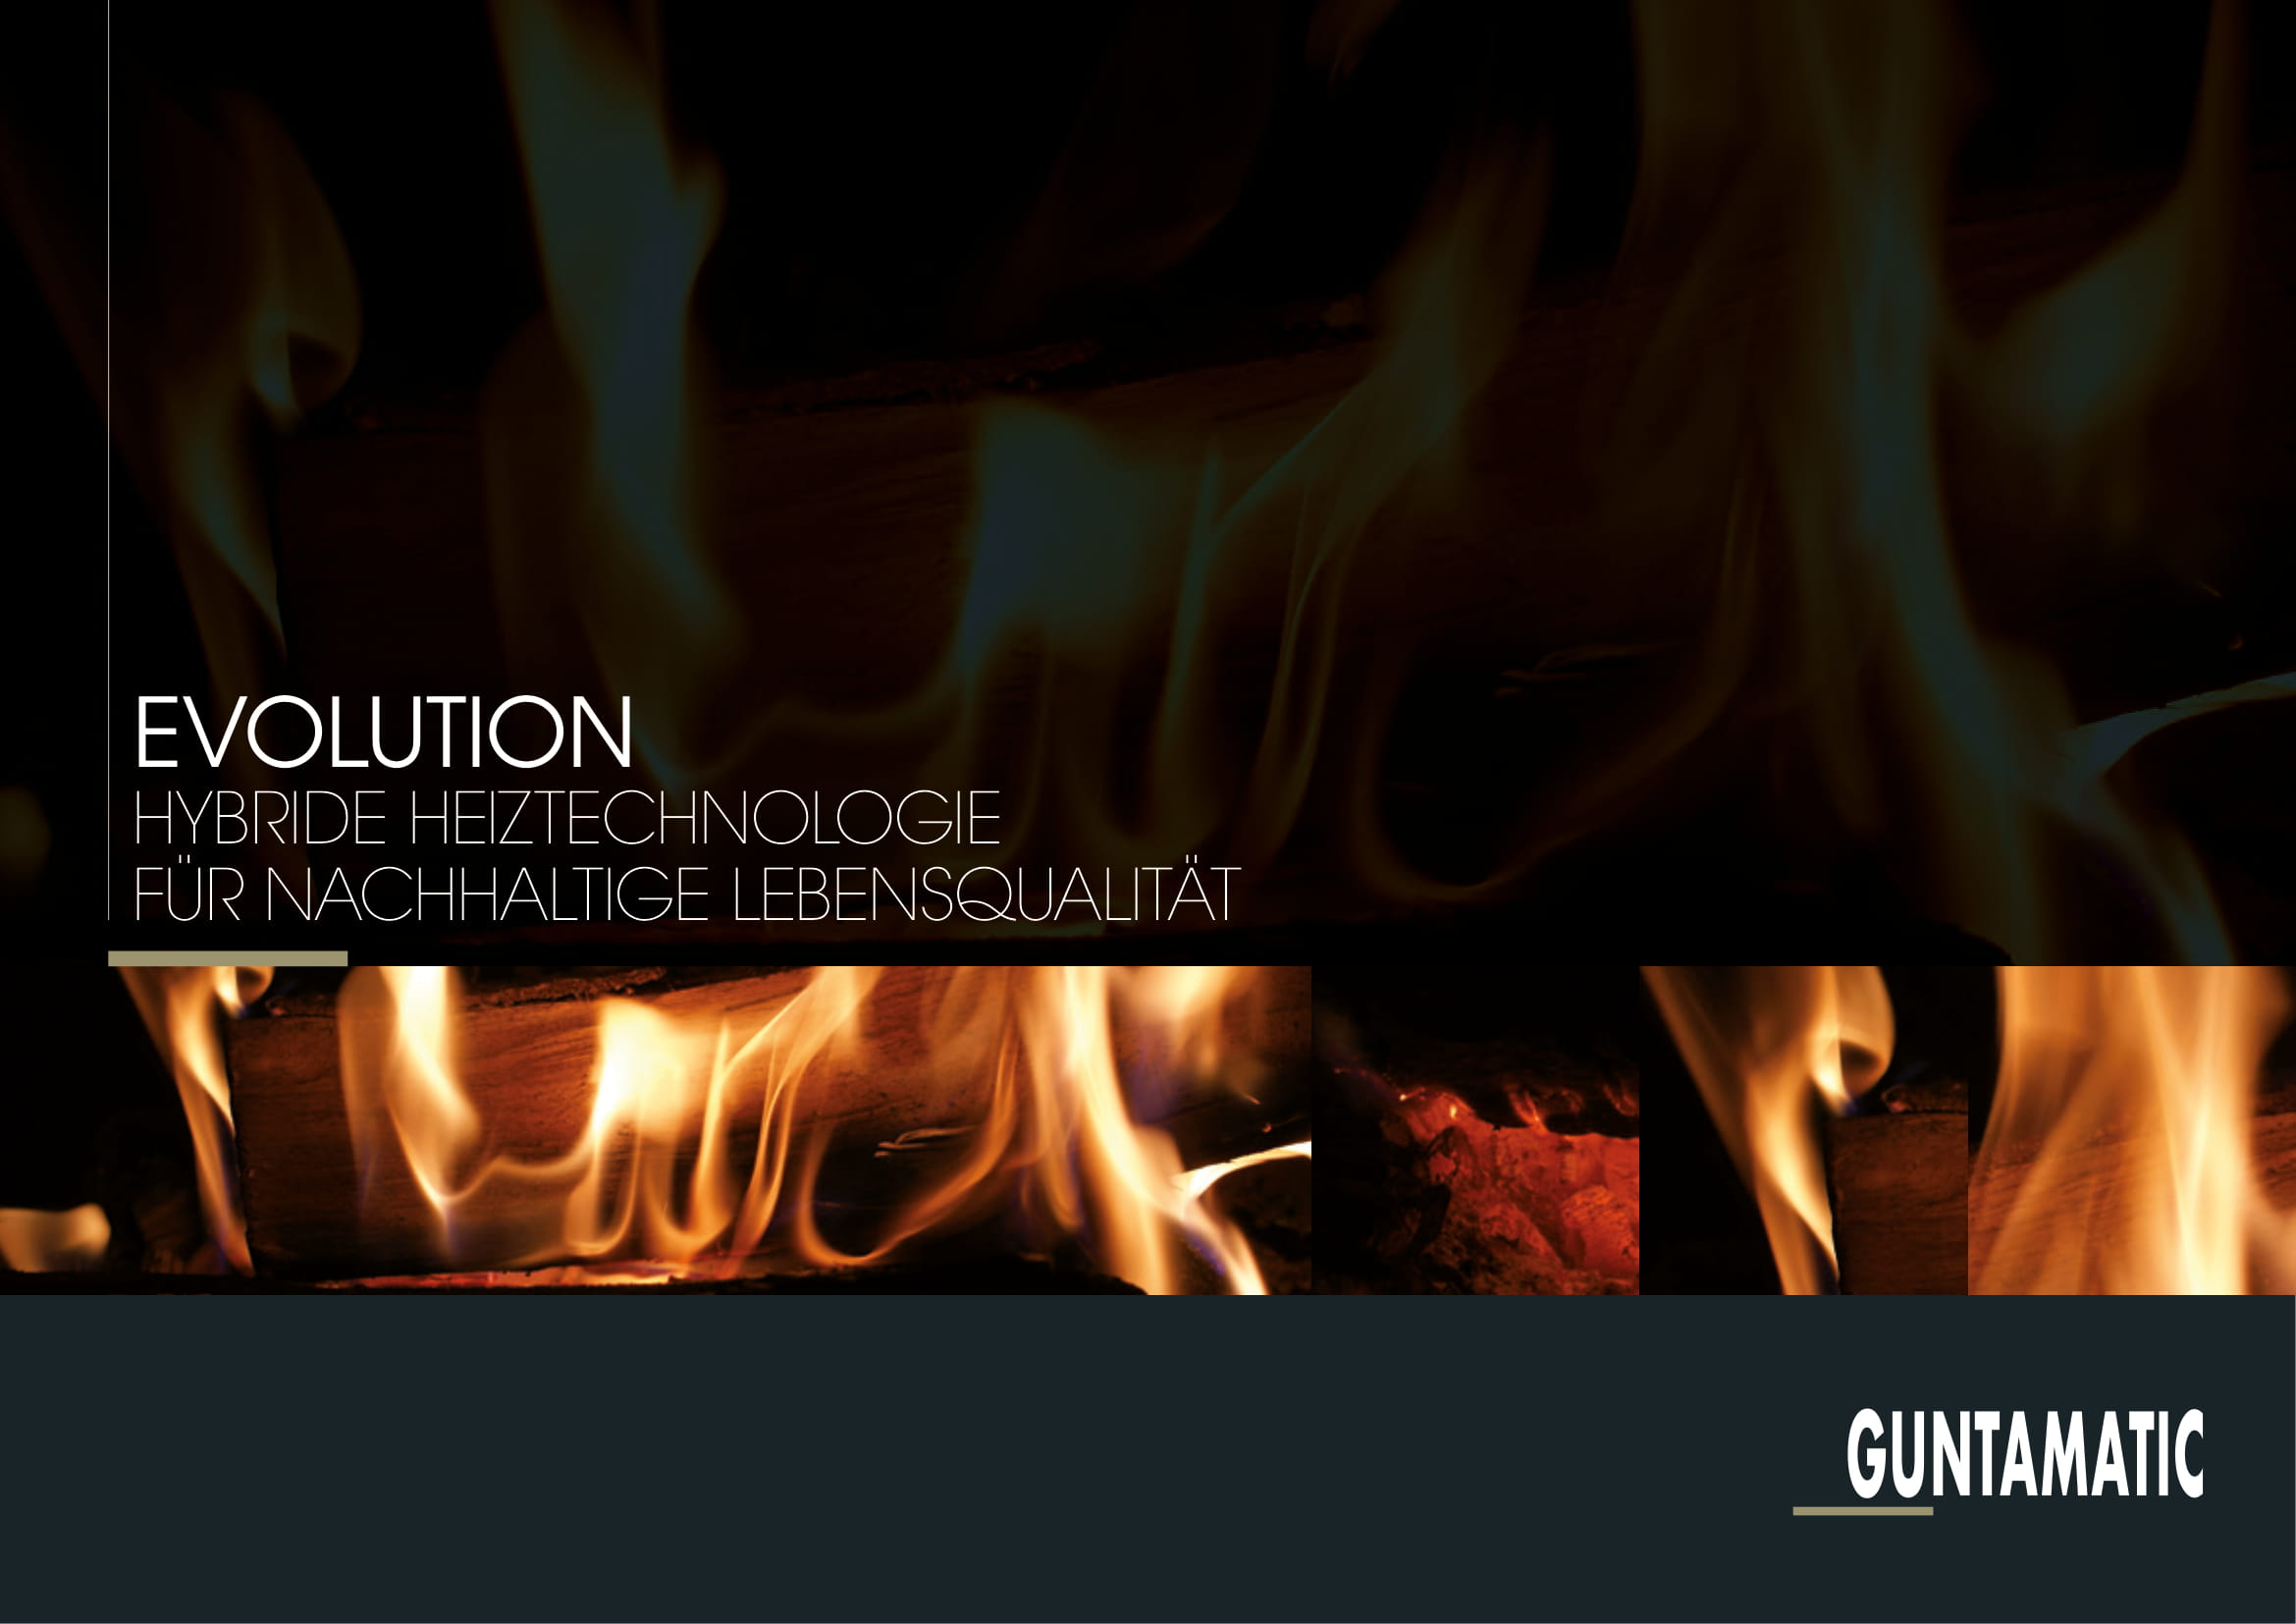 Guntamatic Hybridheizung EVOLUTION